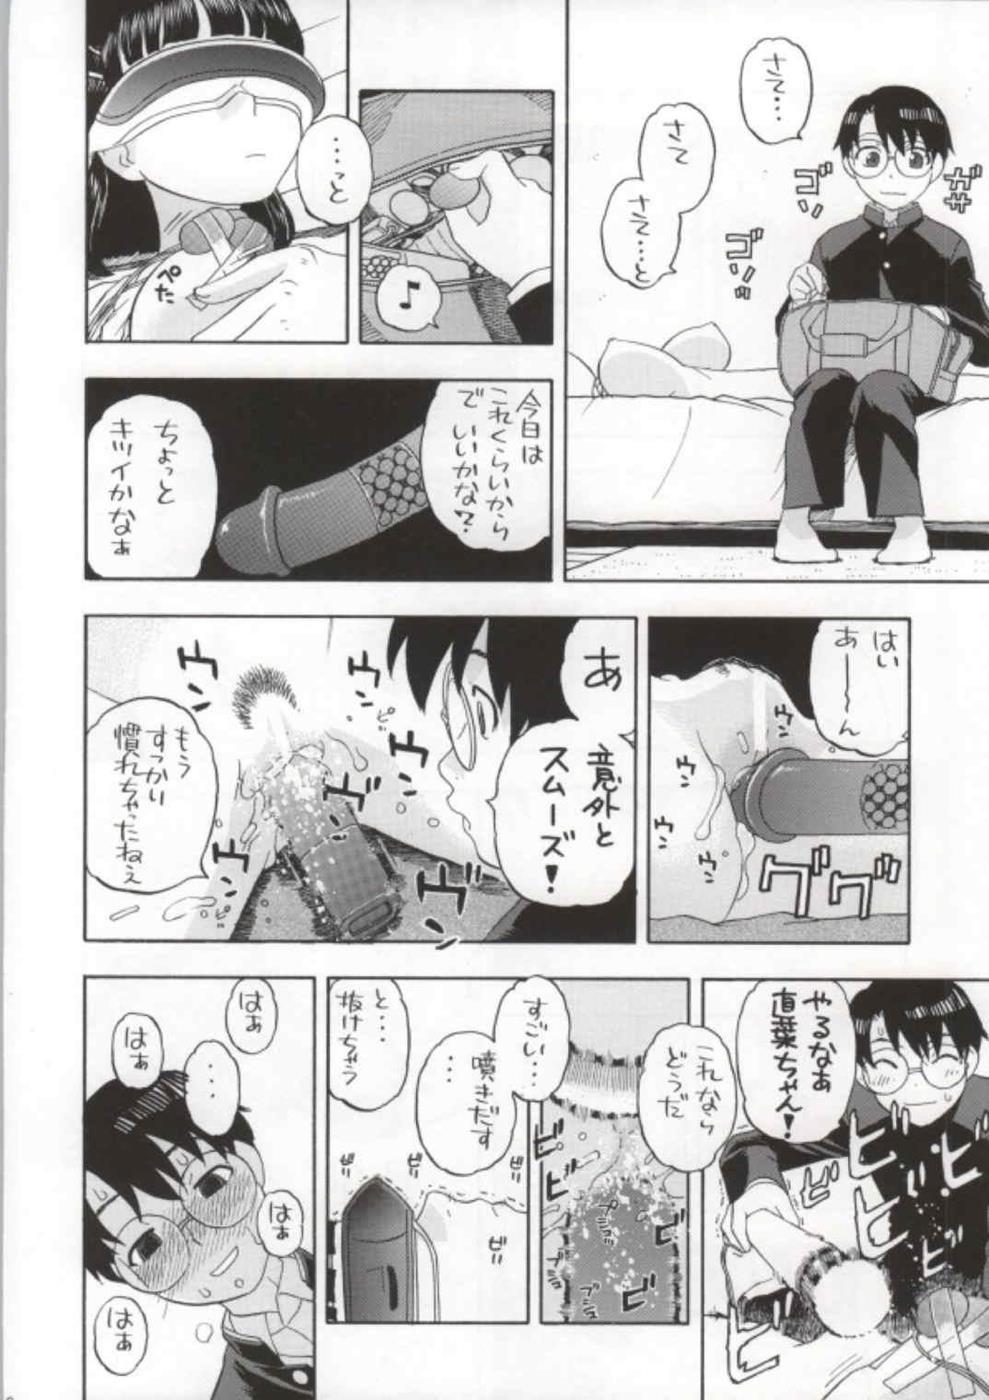 Suguha-chan ga Ikenain Dakara ne 6